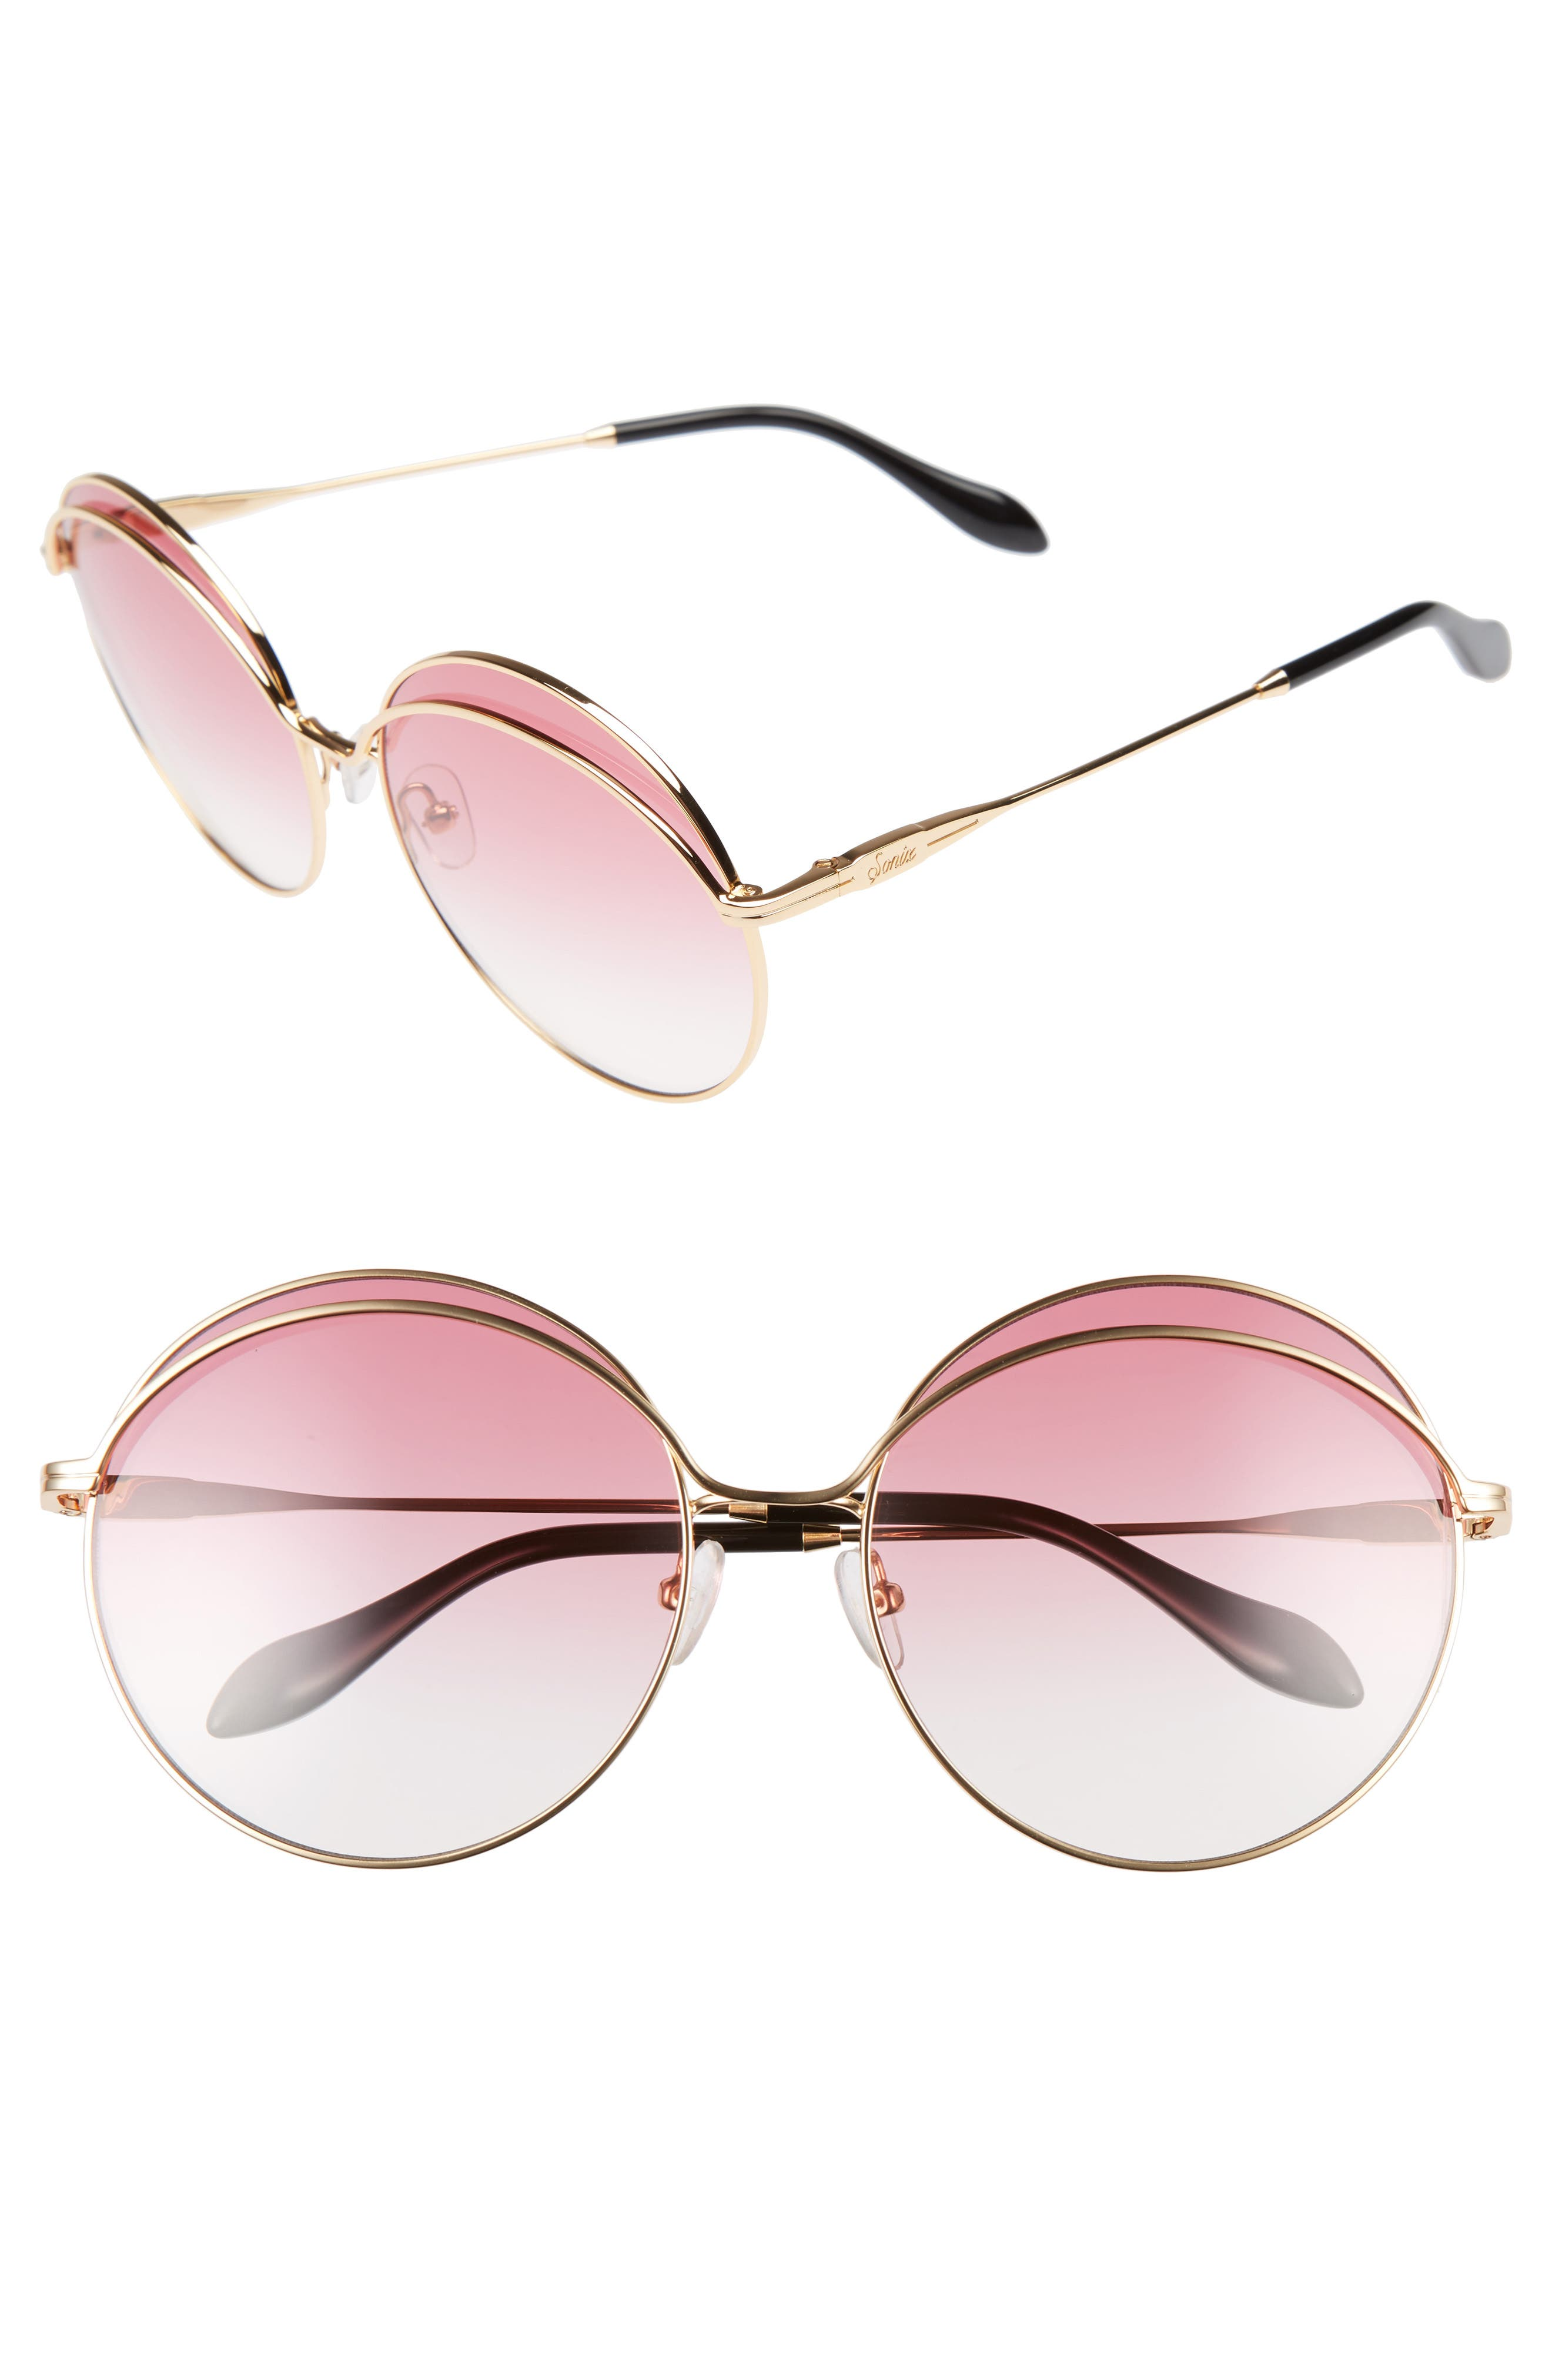 Main Image - Sonix Oasis 63mm Round Sunglasses